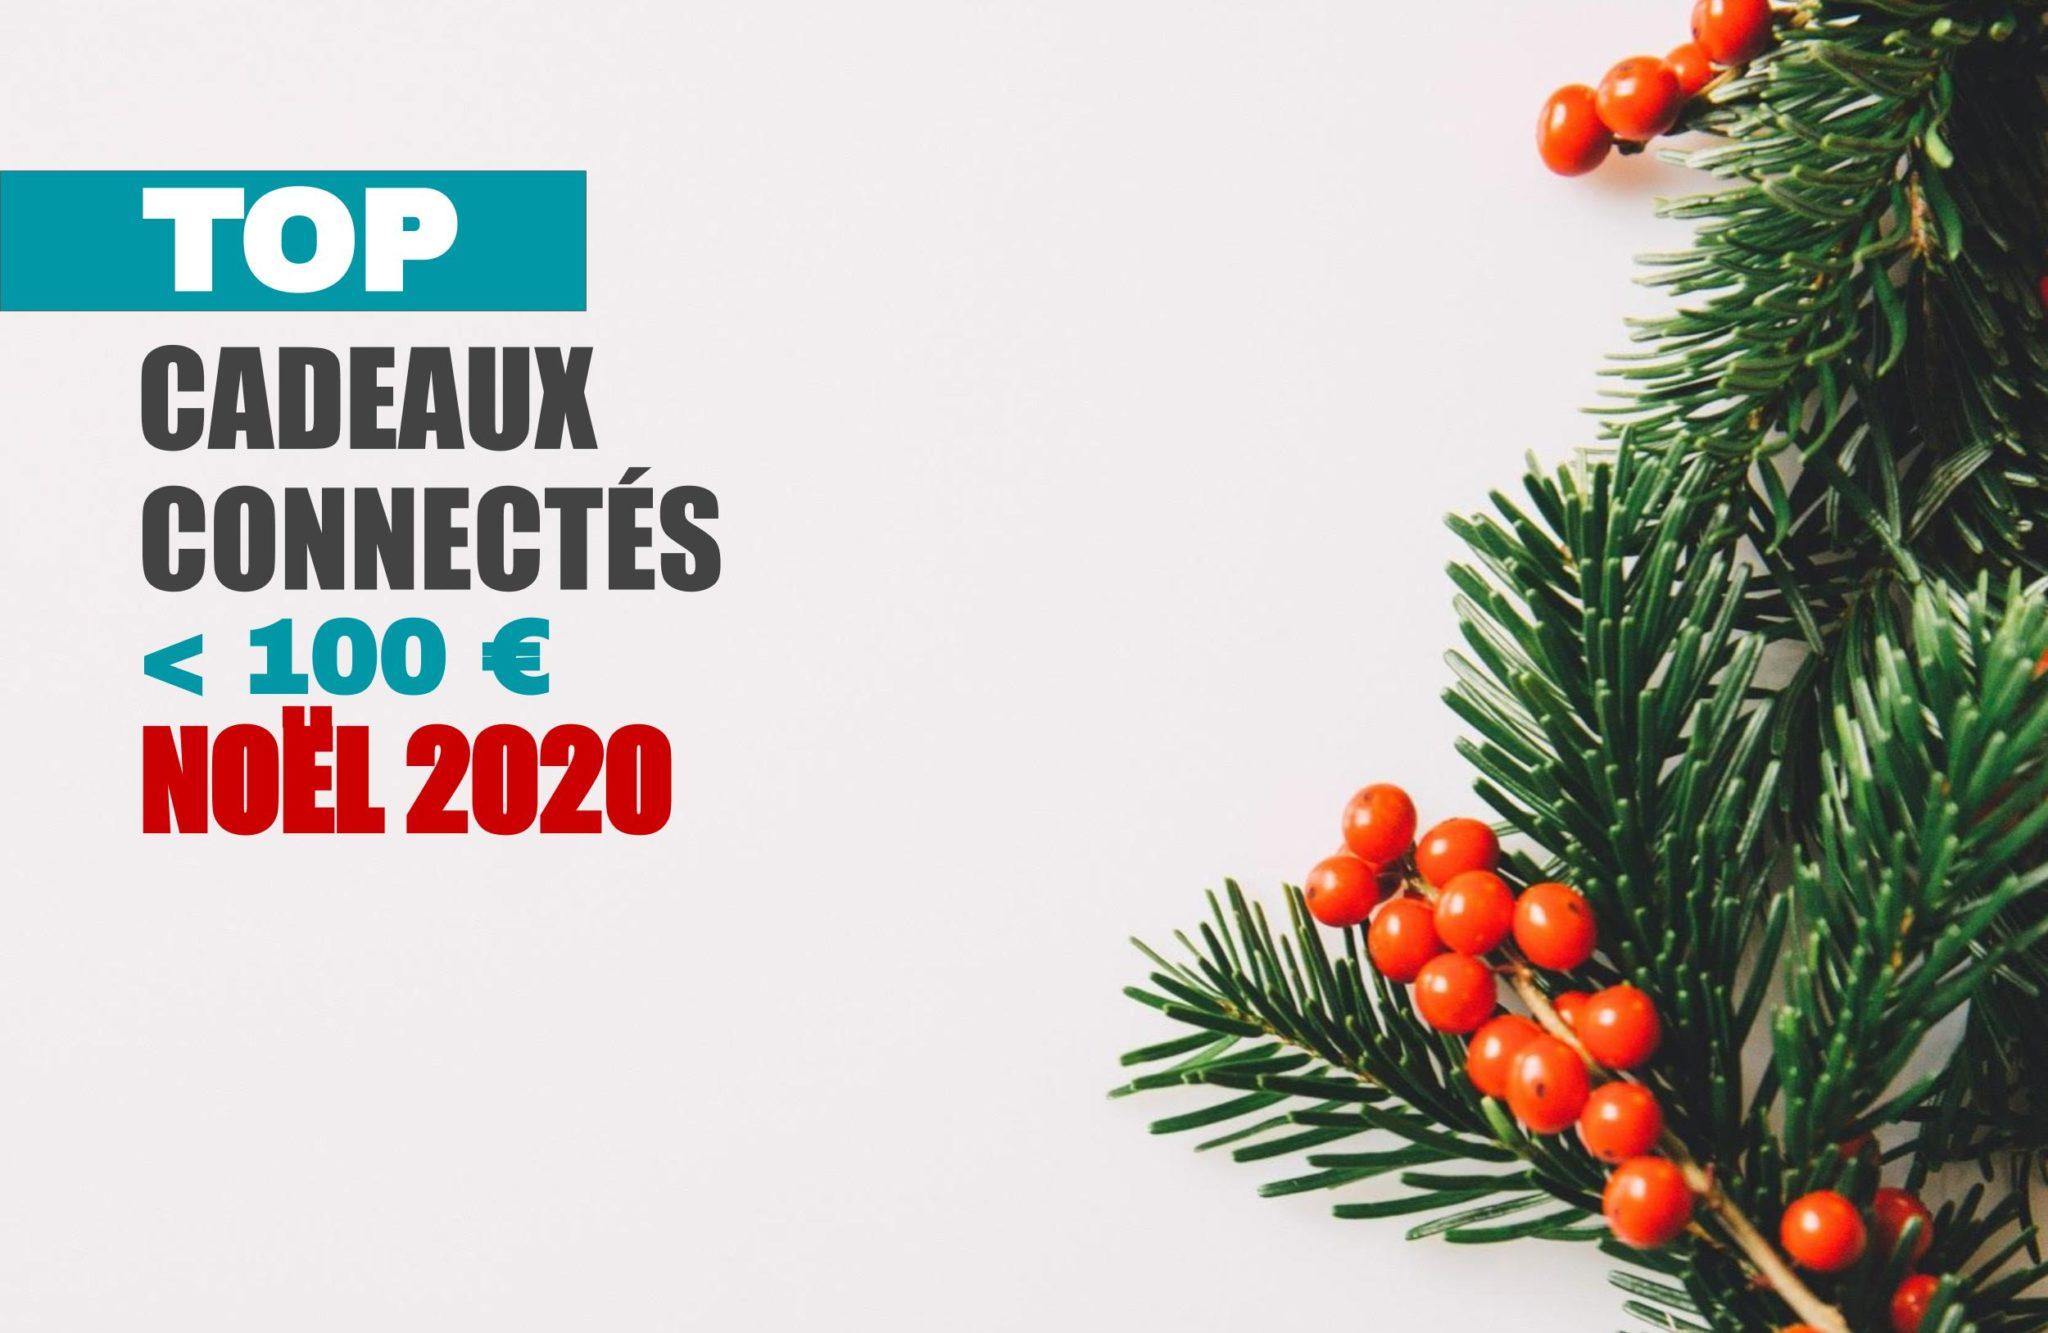 cadeau noËl moins 100 euros